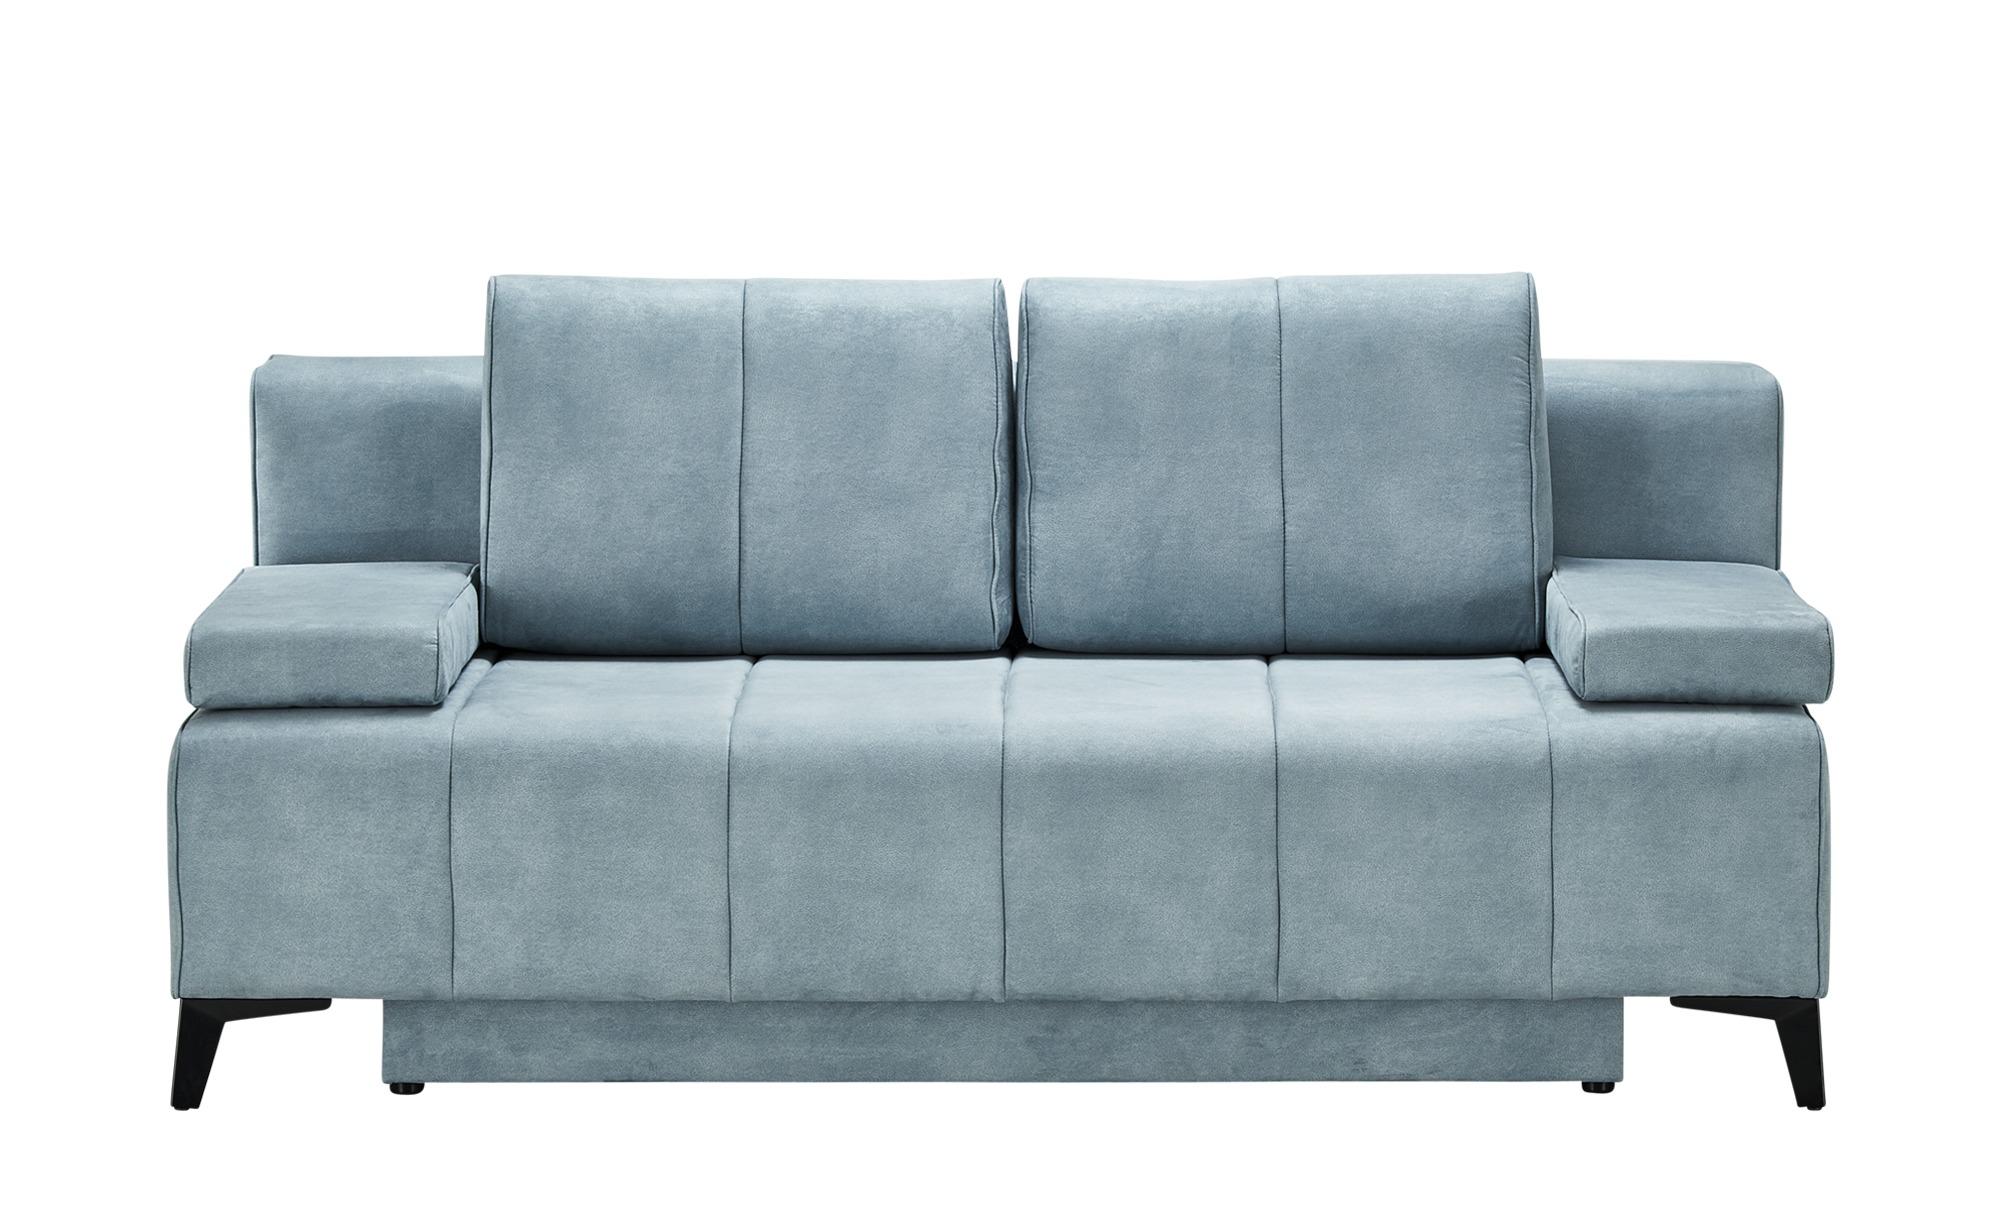 Schlafsofa  Clara ¦ blau ¦ Maße (cm): B: 200 H: 94 T: 102 Polstermöbel > Sofas > 2-Sitzer - Höffner